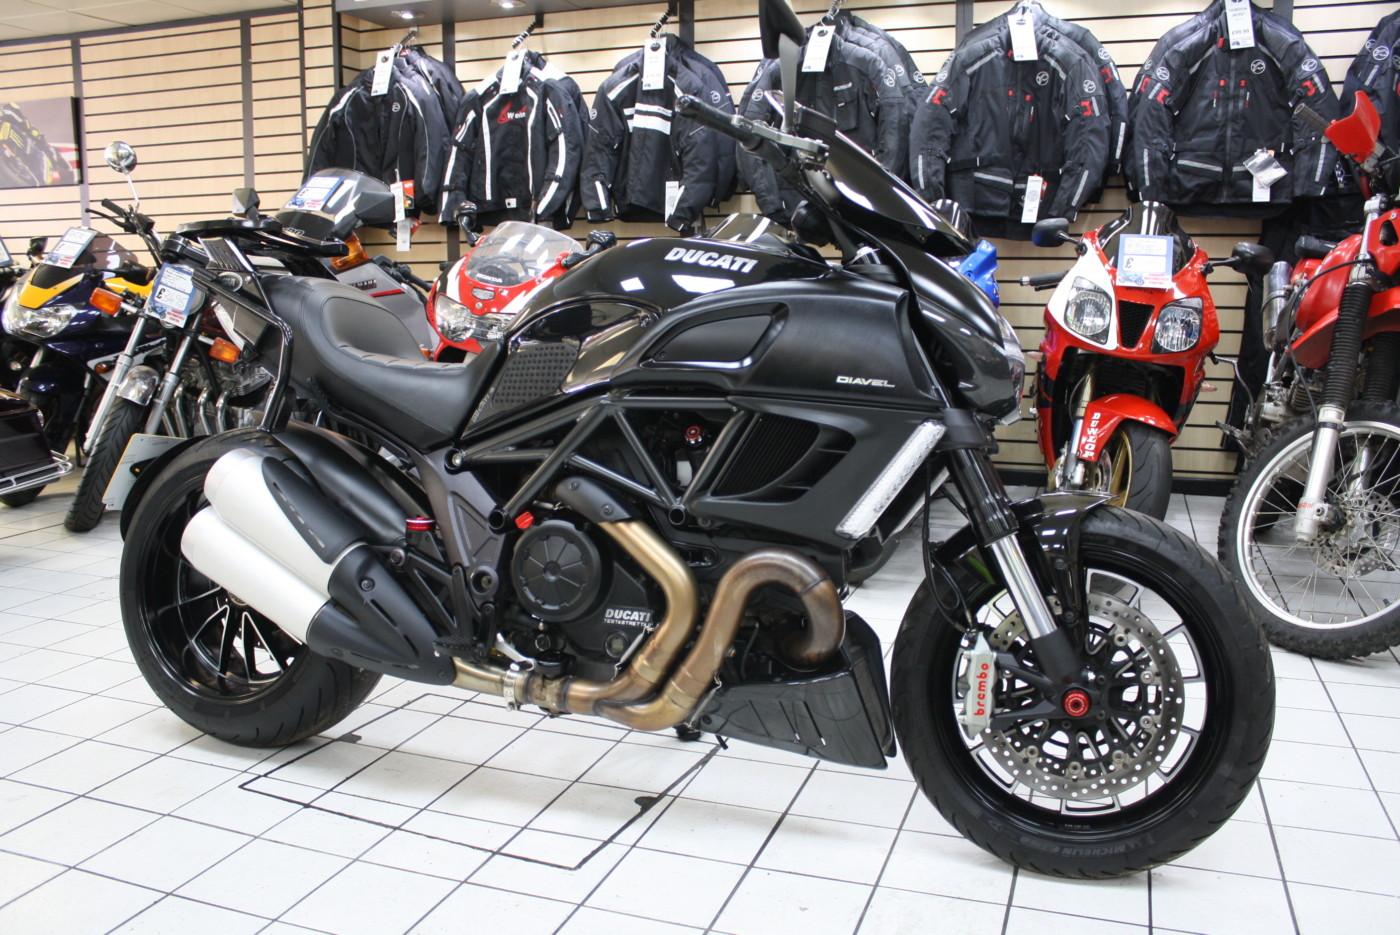 Ducati Diavel 1198 Black